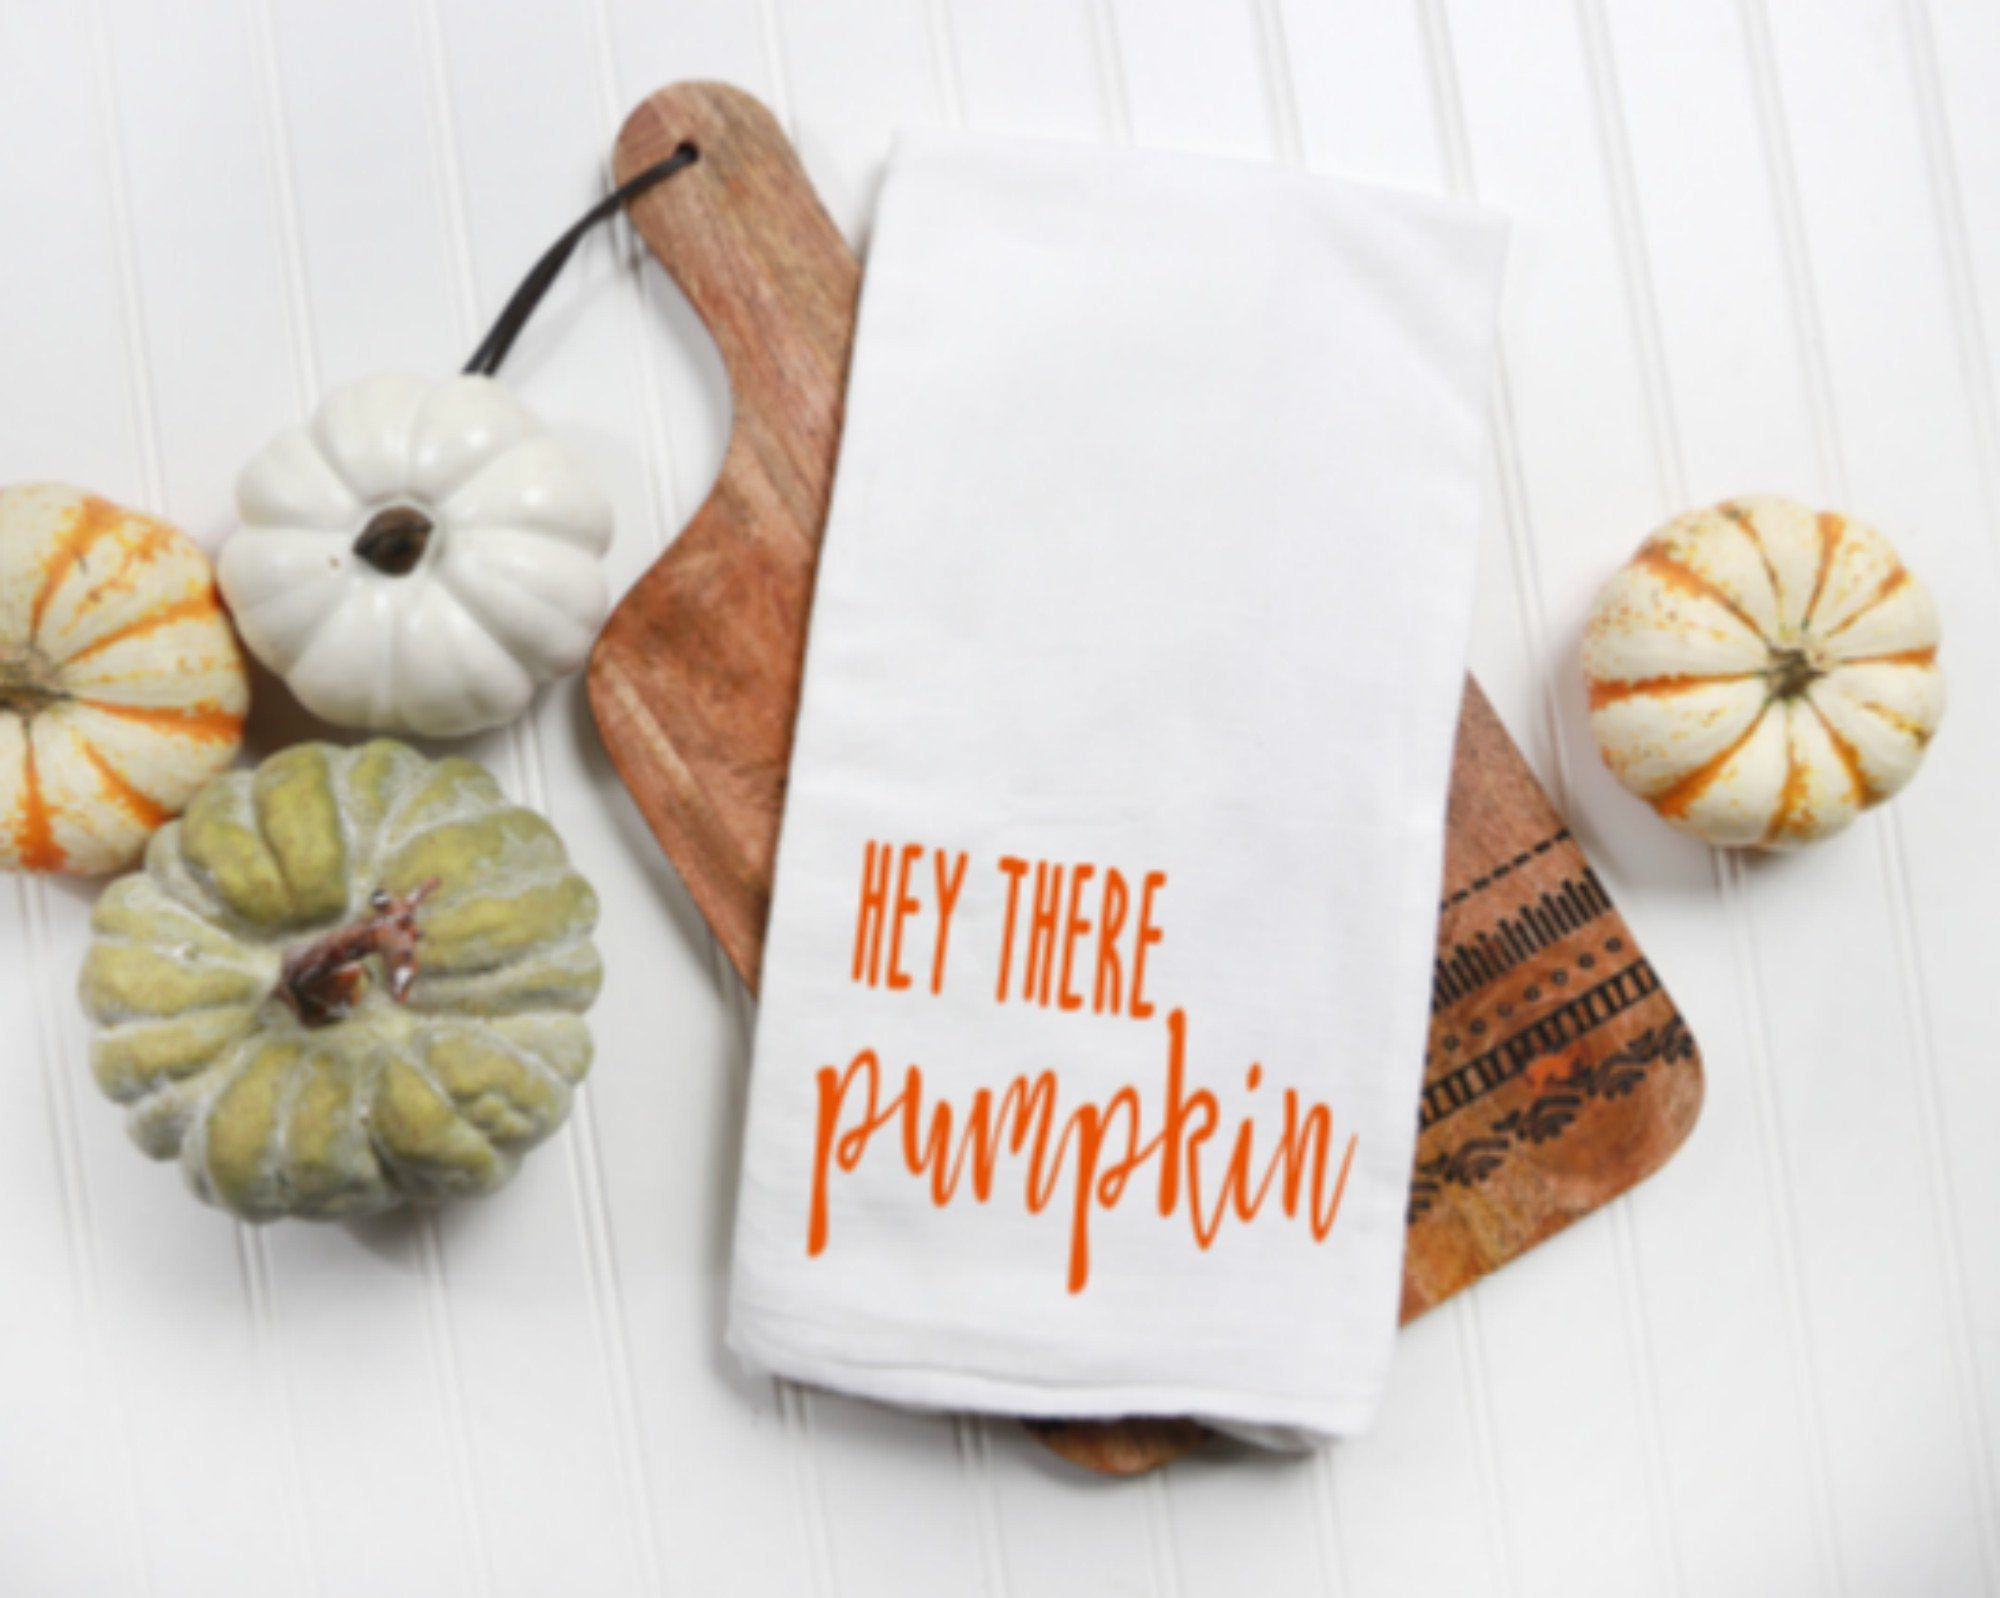 Farmhouse Decor Flour Sack Towels Tea Towel Flour Sack Dish Towel. Farmhouse Kitchen Towels Pumpkin Truck